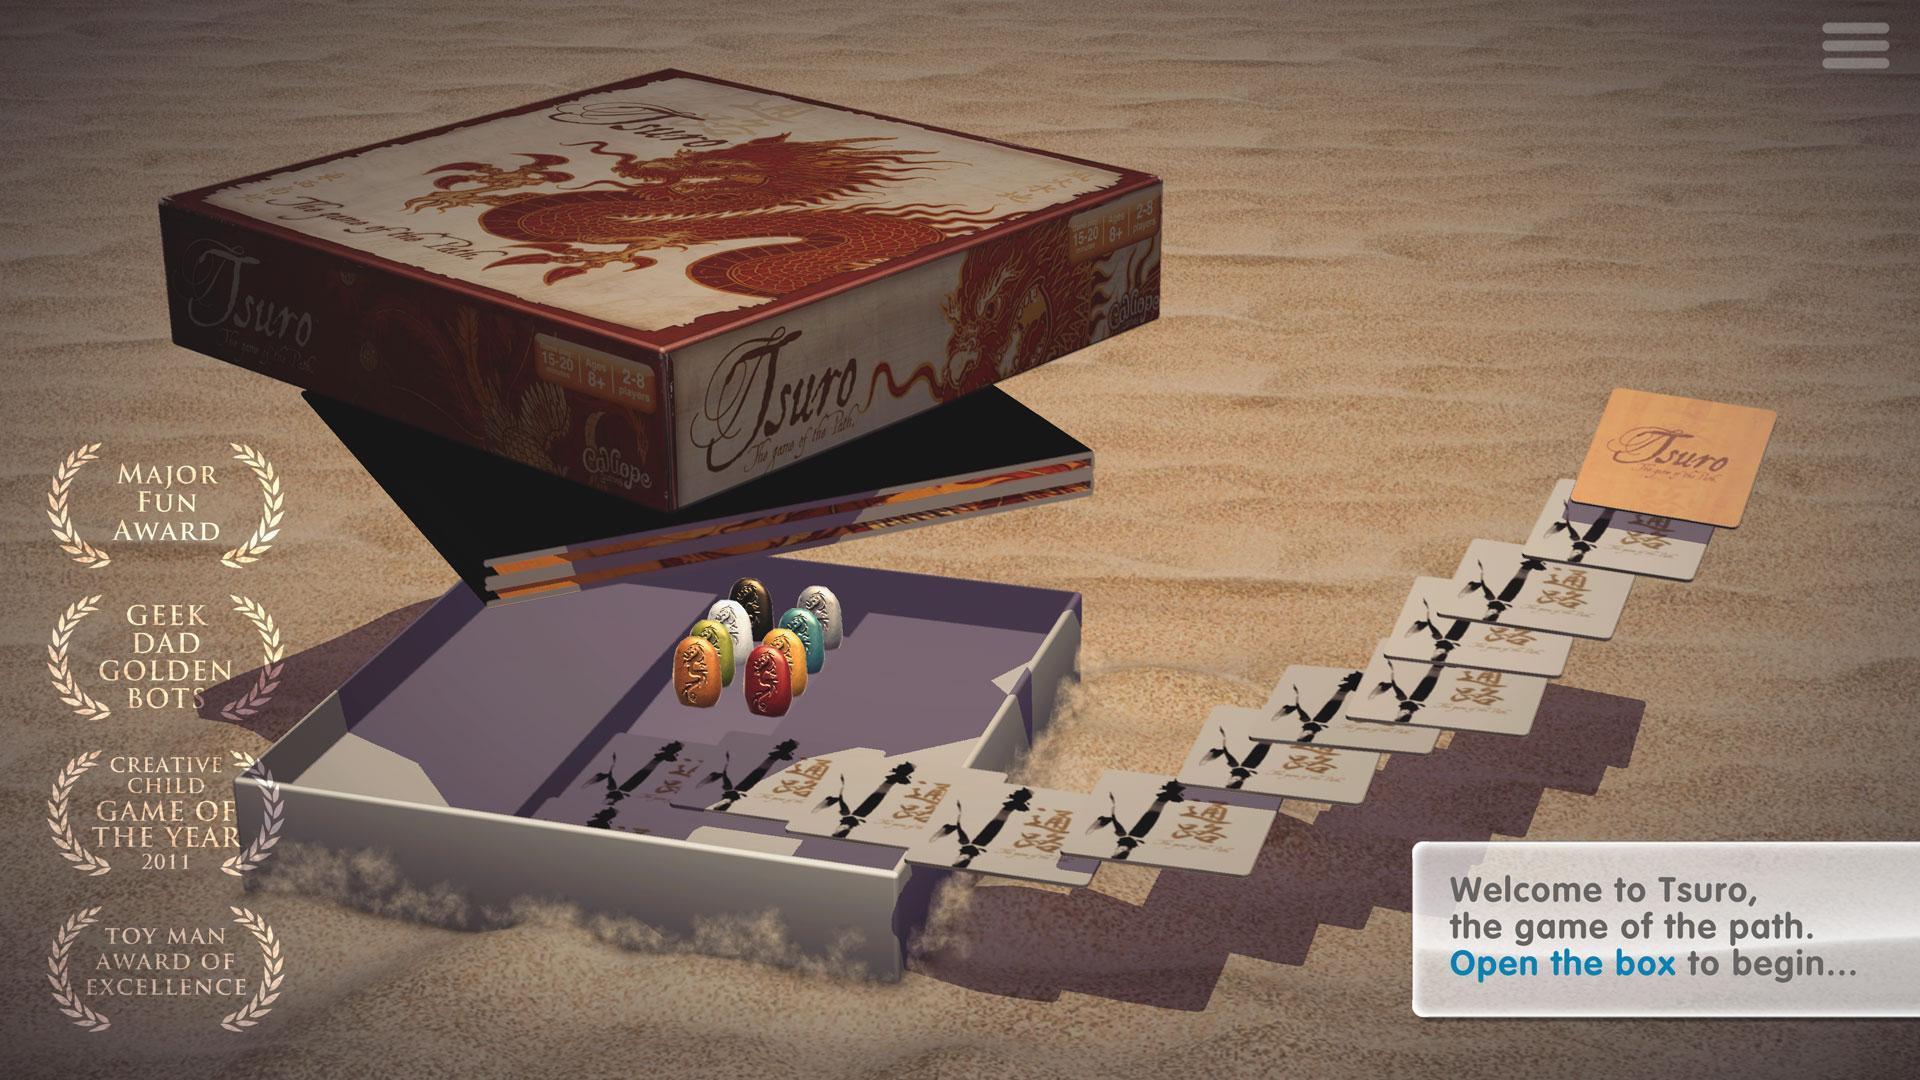 Tsuro - The Game of the Path screenshot #5